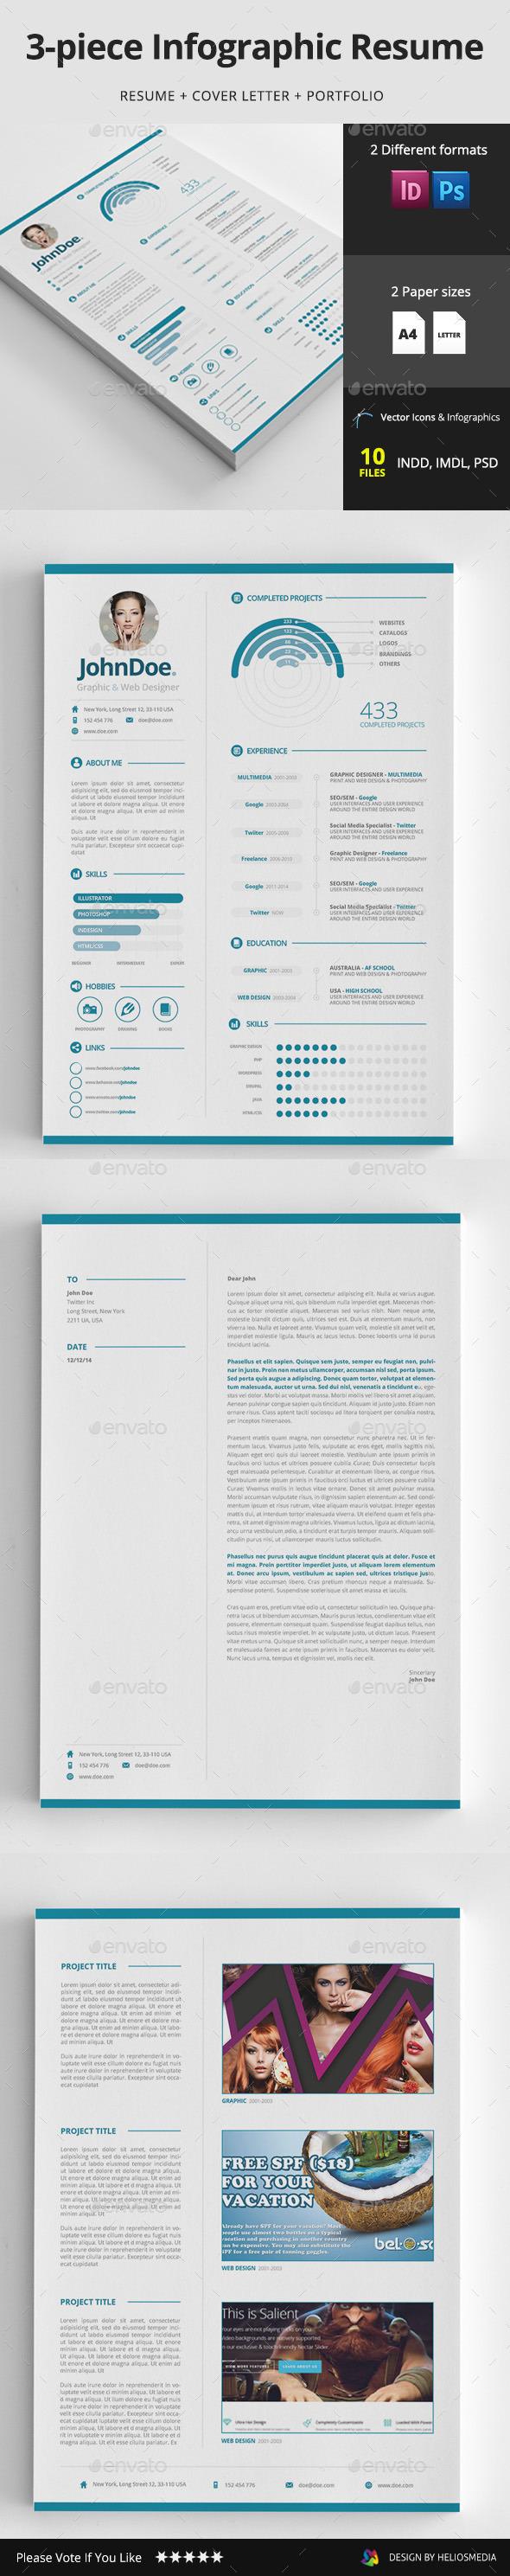 3-piece Infographic Resume / CV